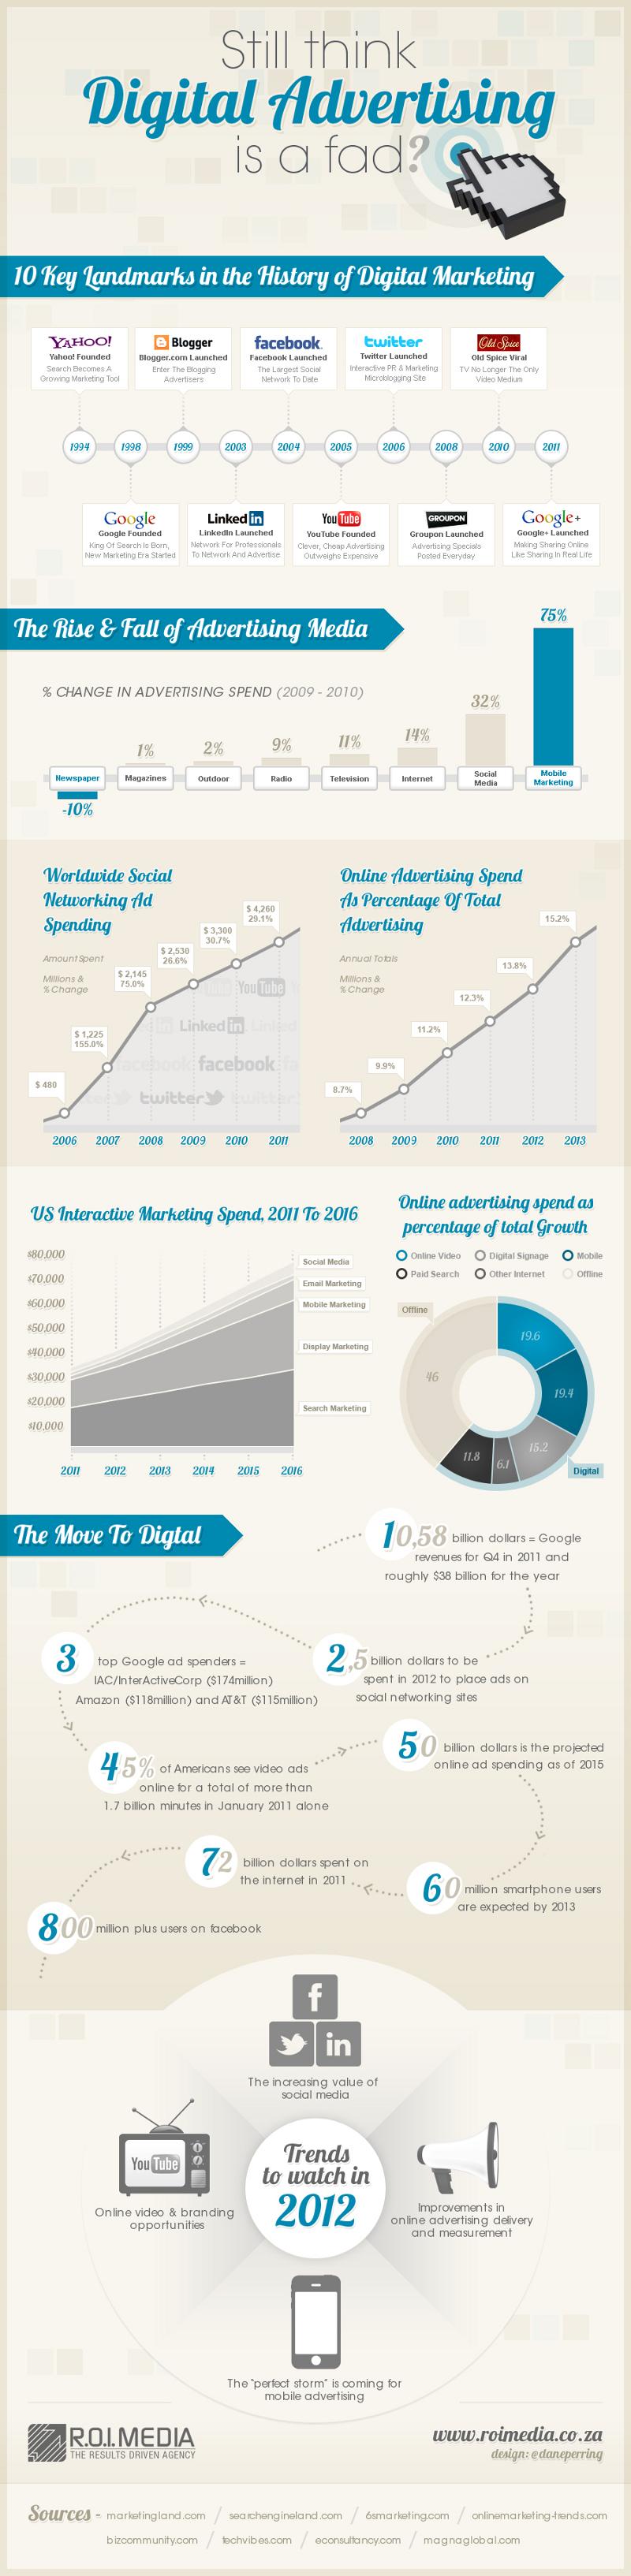 Digital Advertising Trends